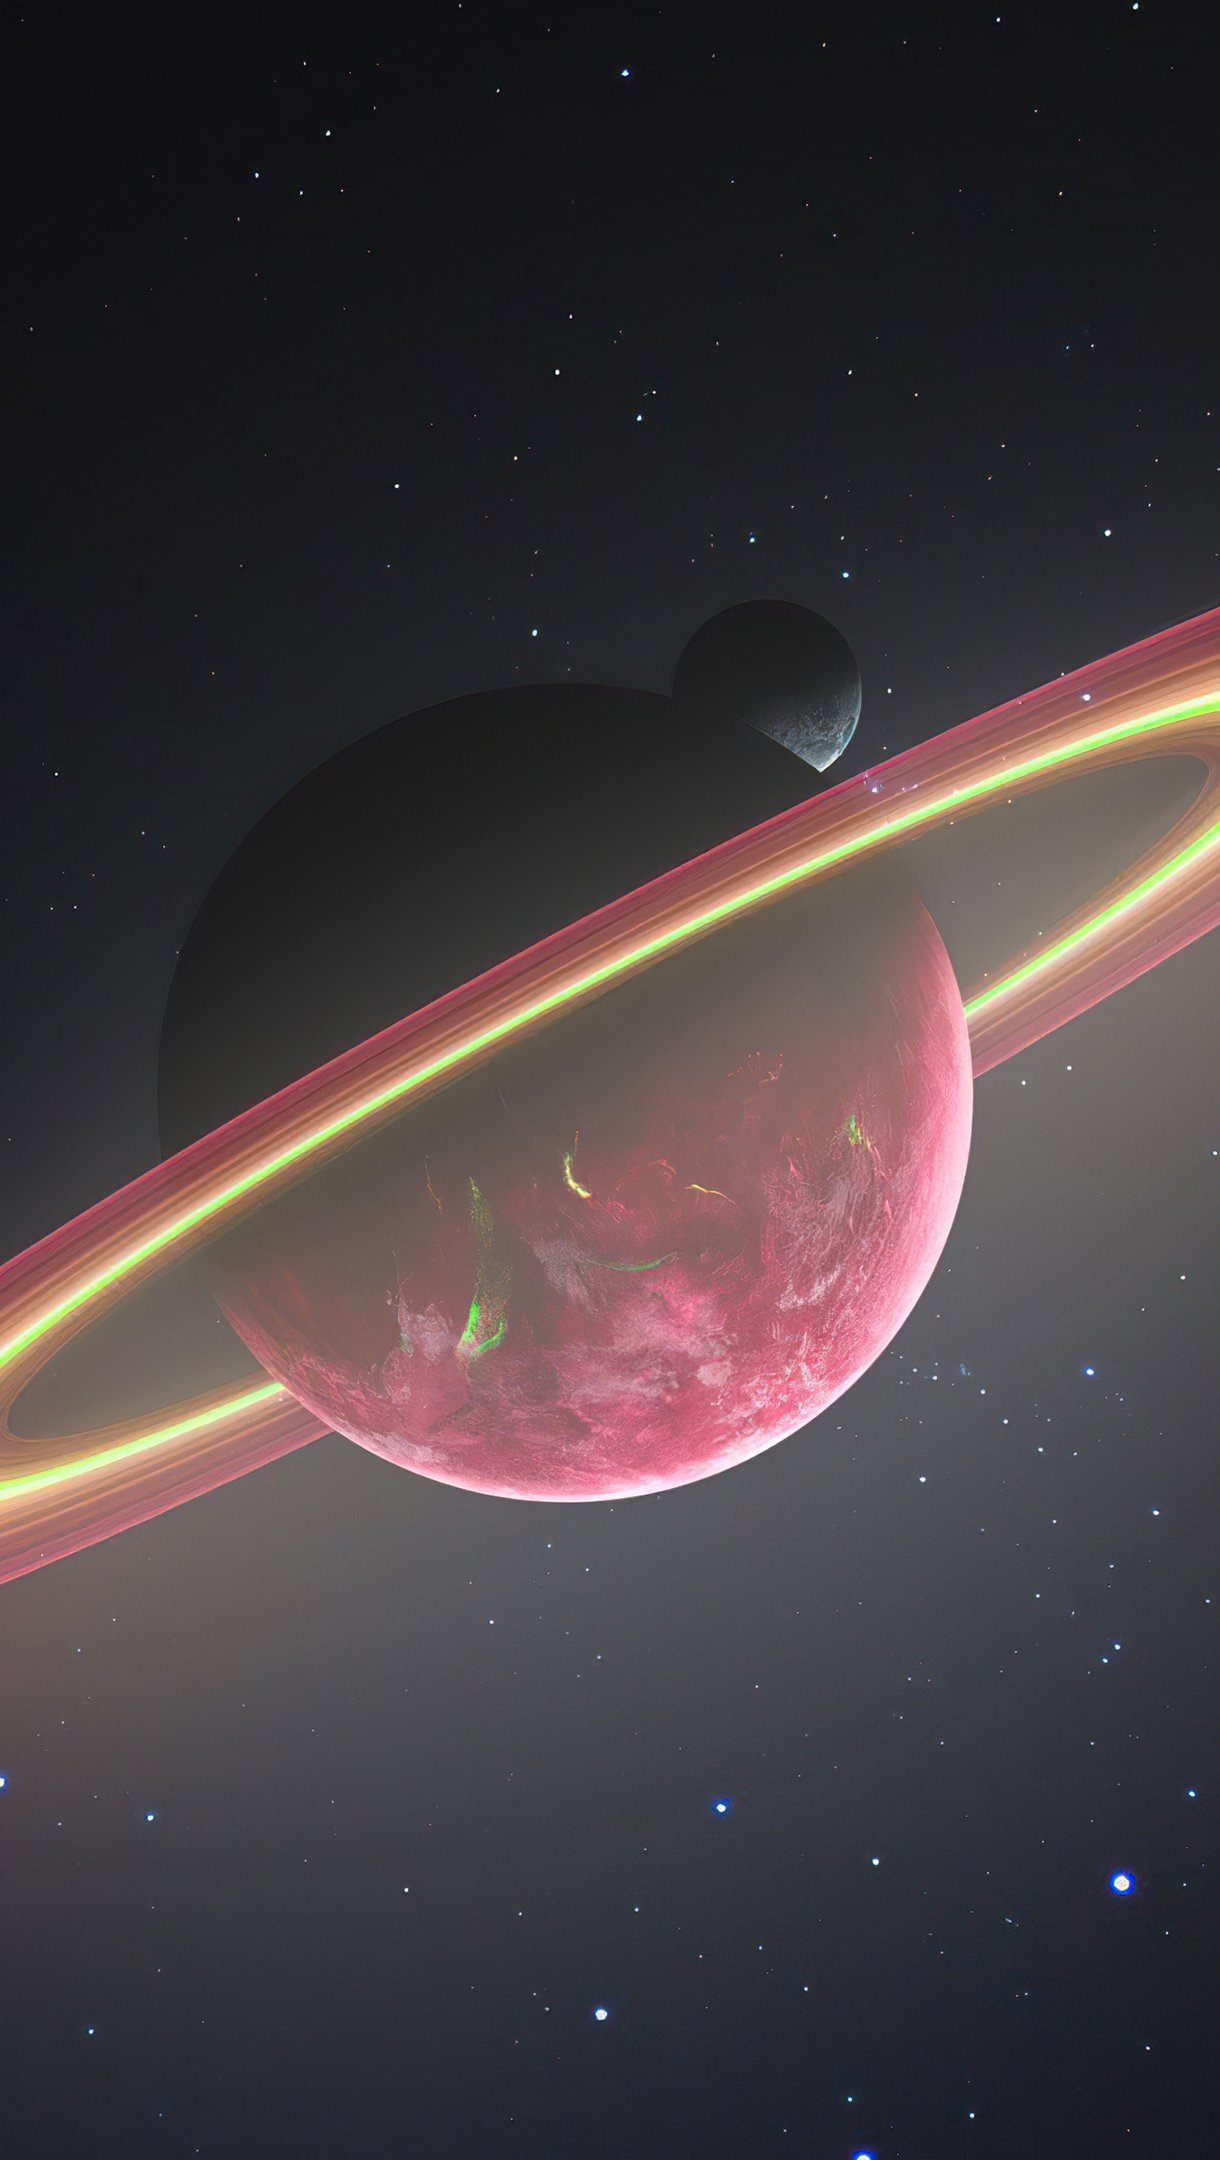 Fondos de pantalla Planeta con anillo y luna Vertical